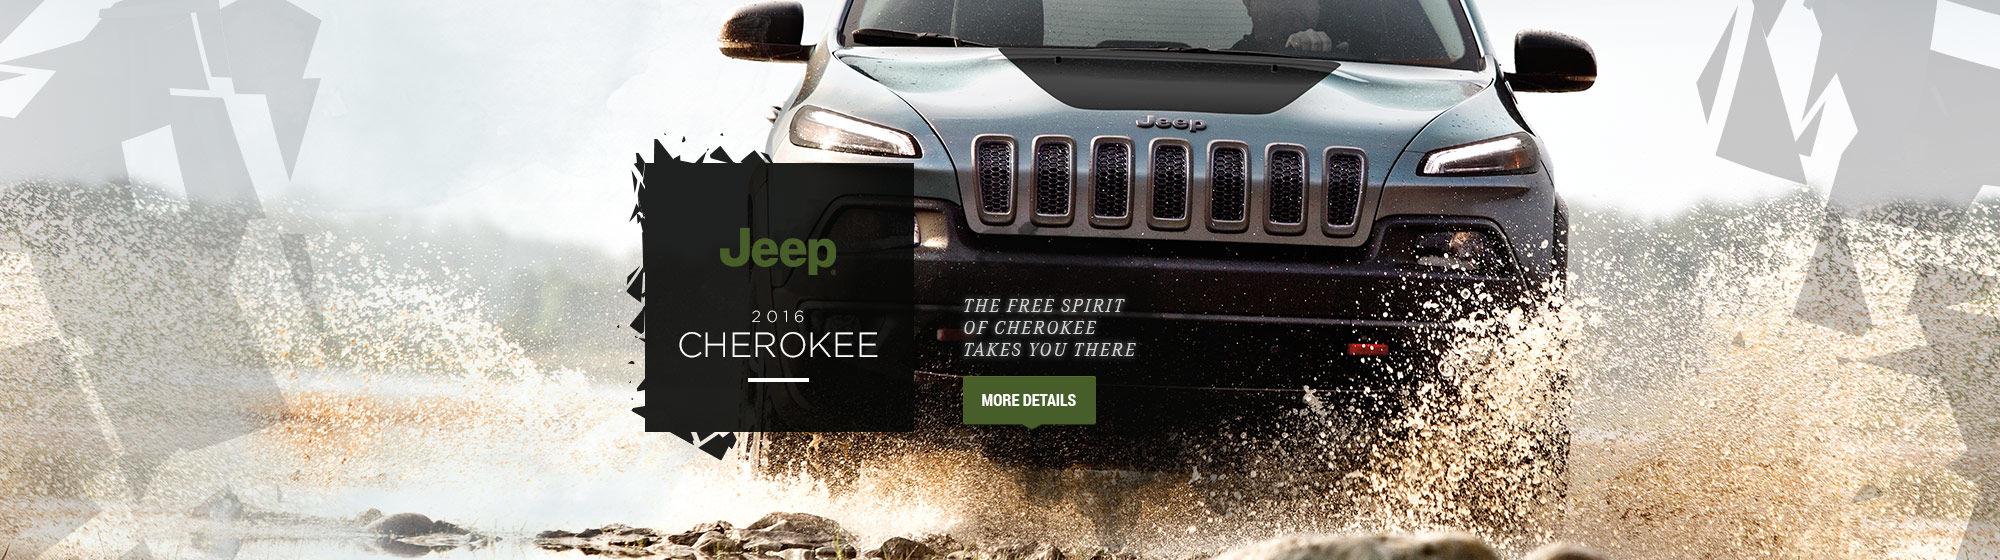 2016 Cherokee